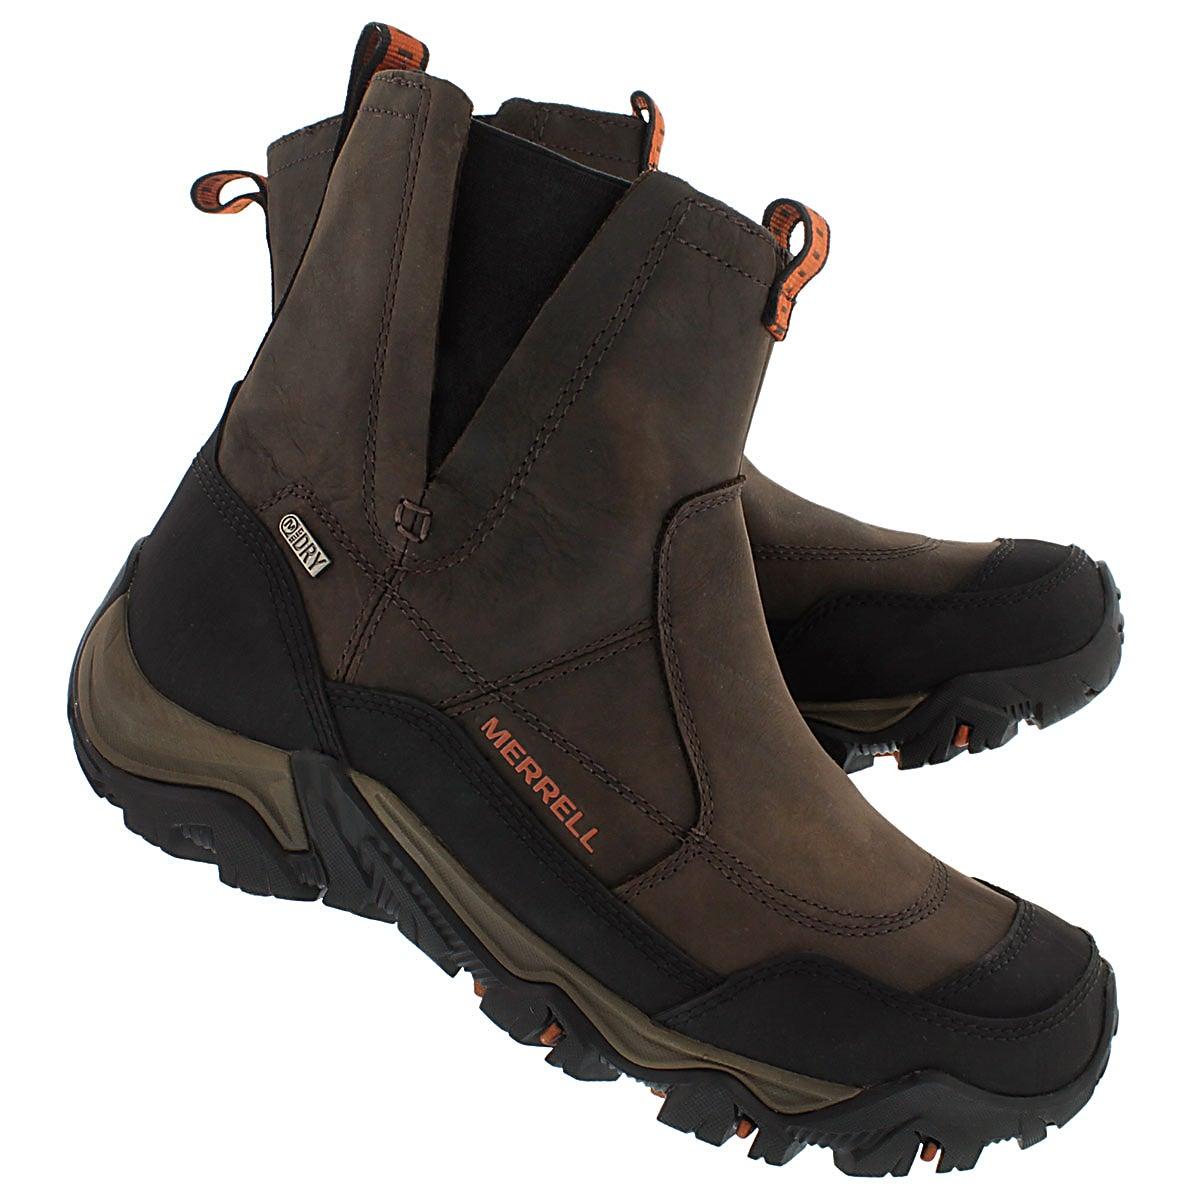 Mns Polarand Rove Pull brn wtrpf boot